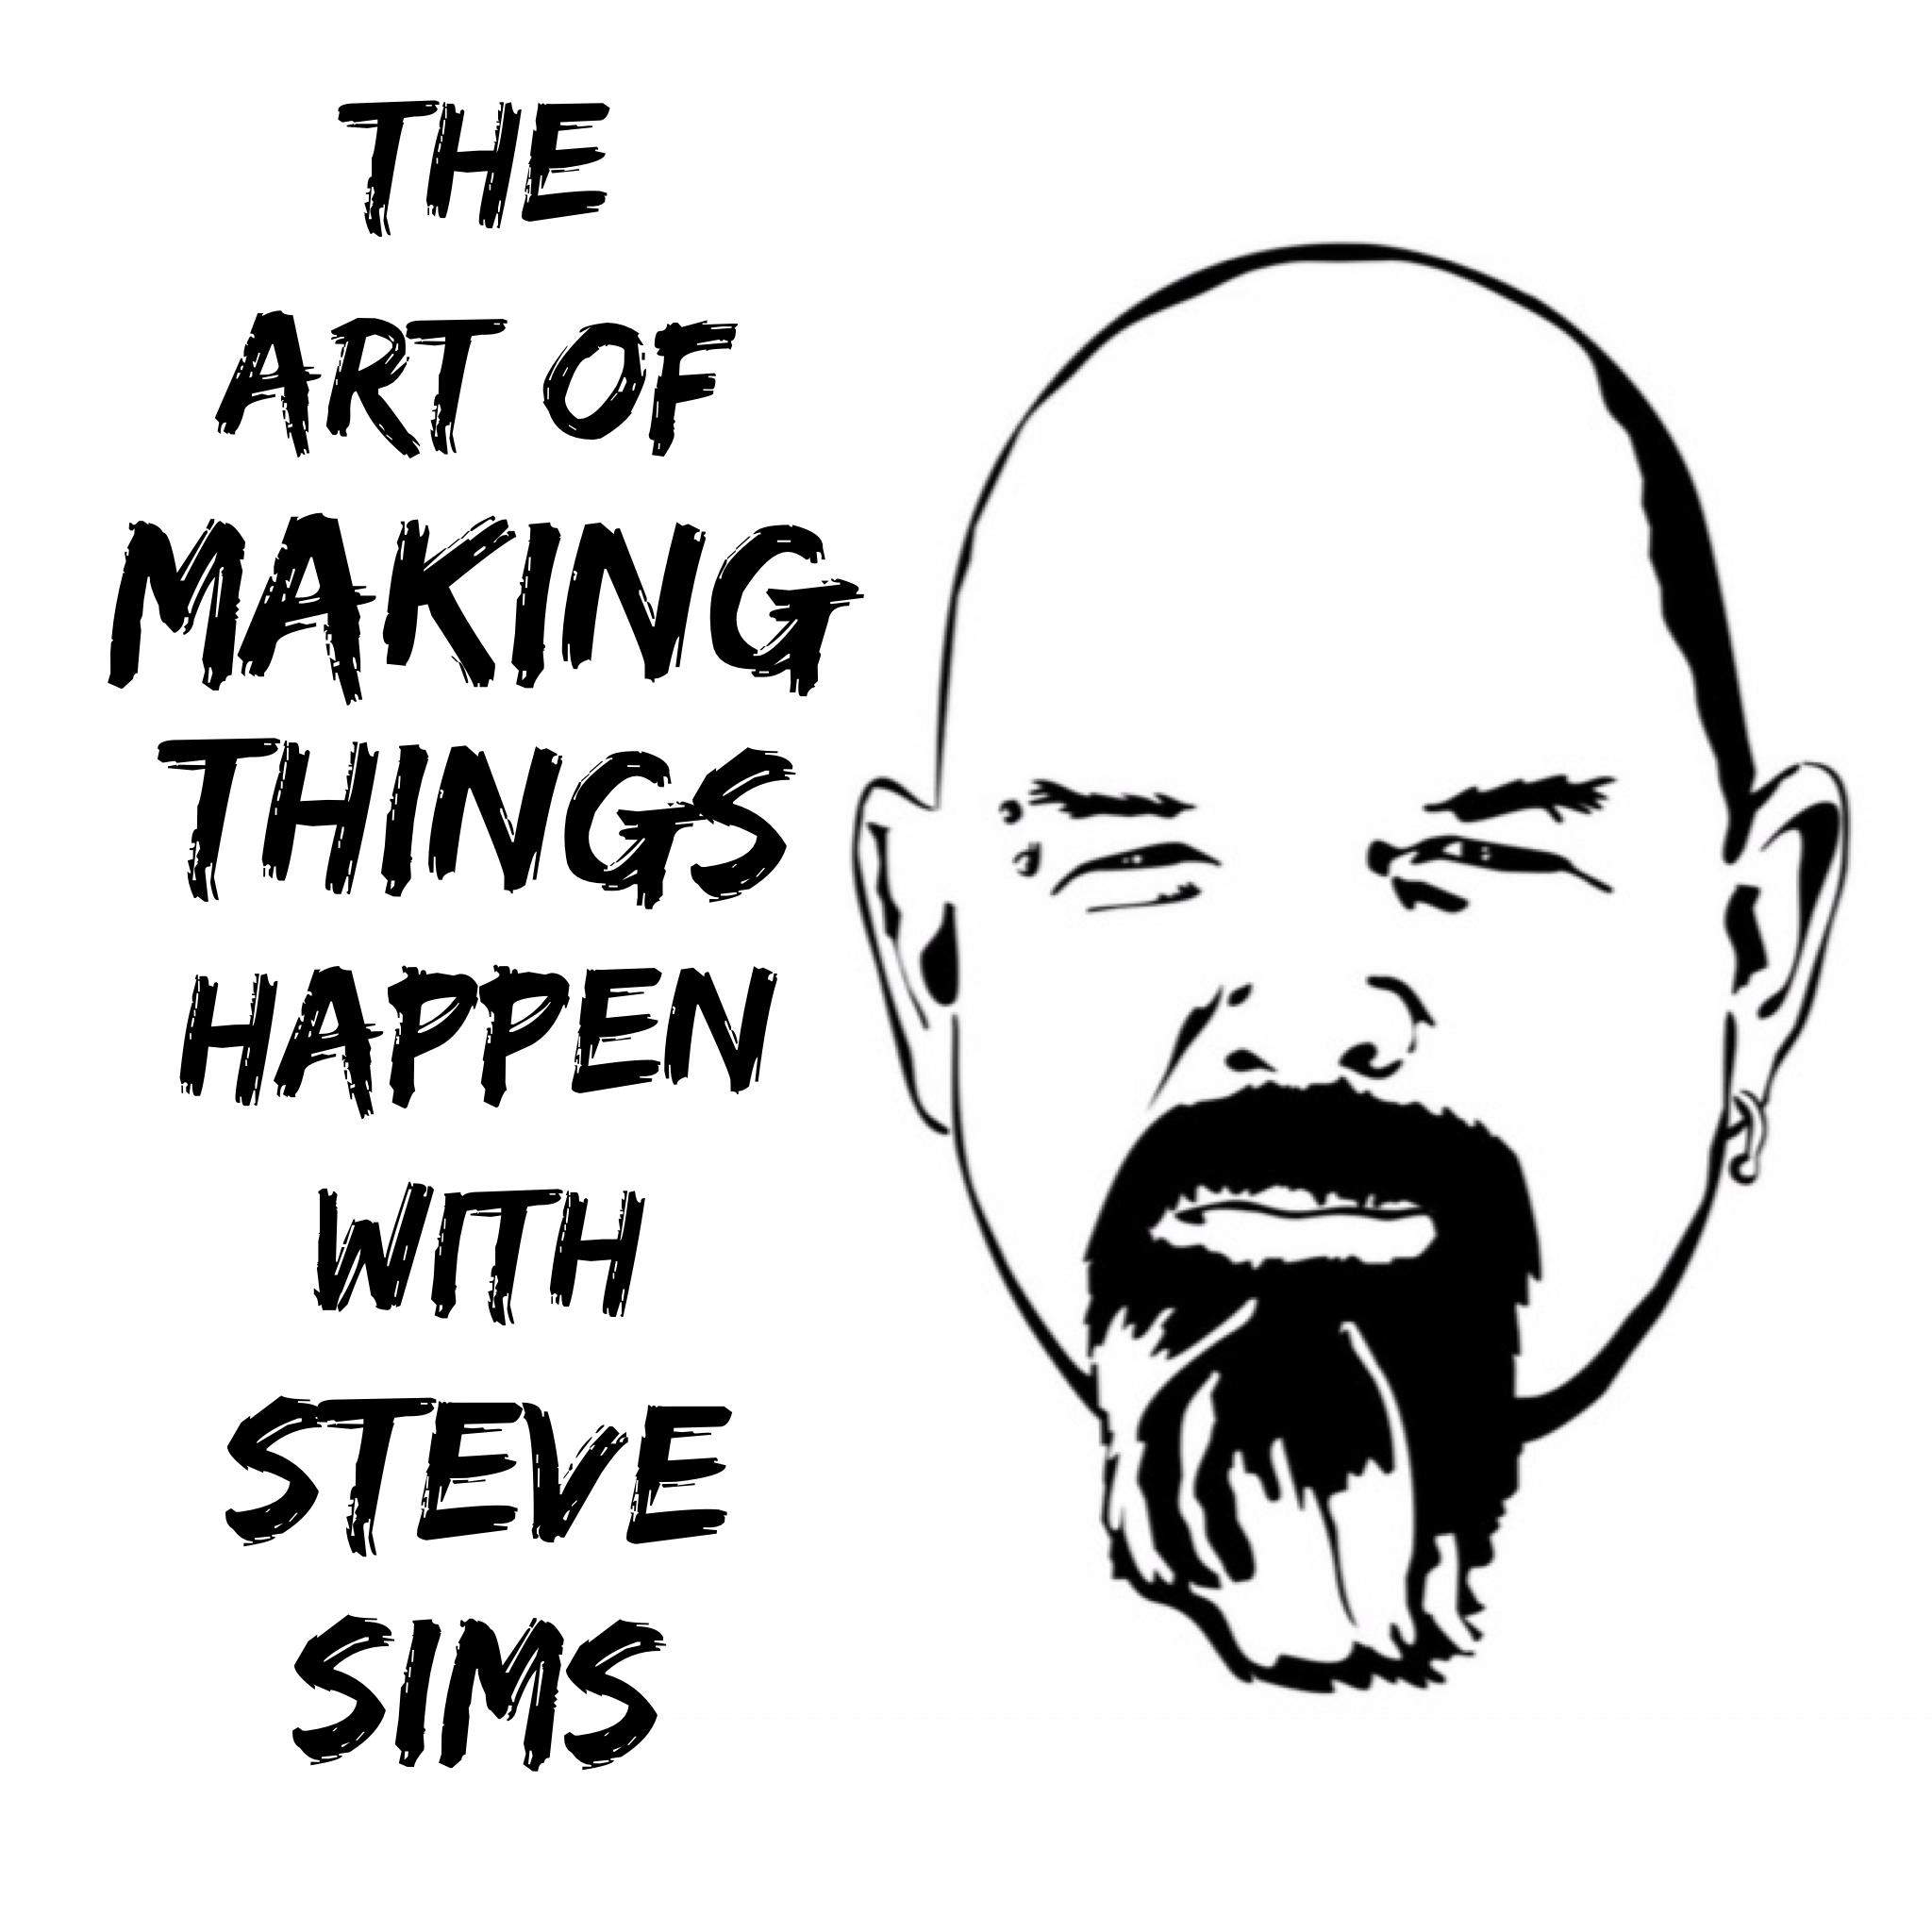 The Art of Making Things Happen (Bluefishing)  Steve Sims show art